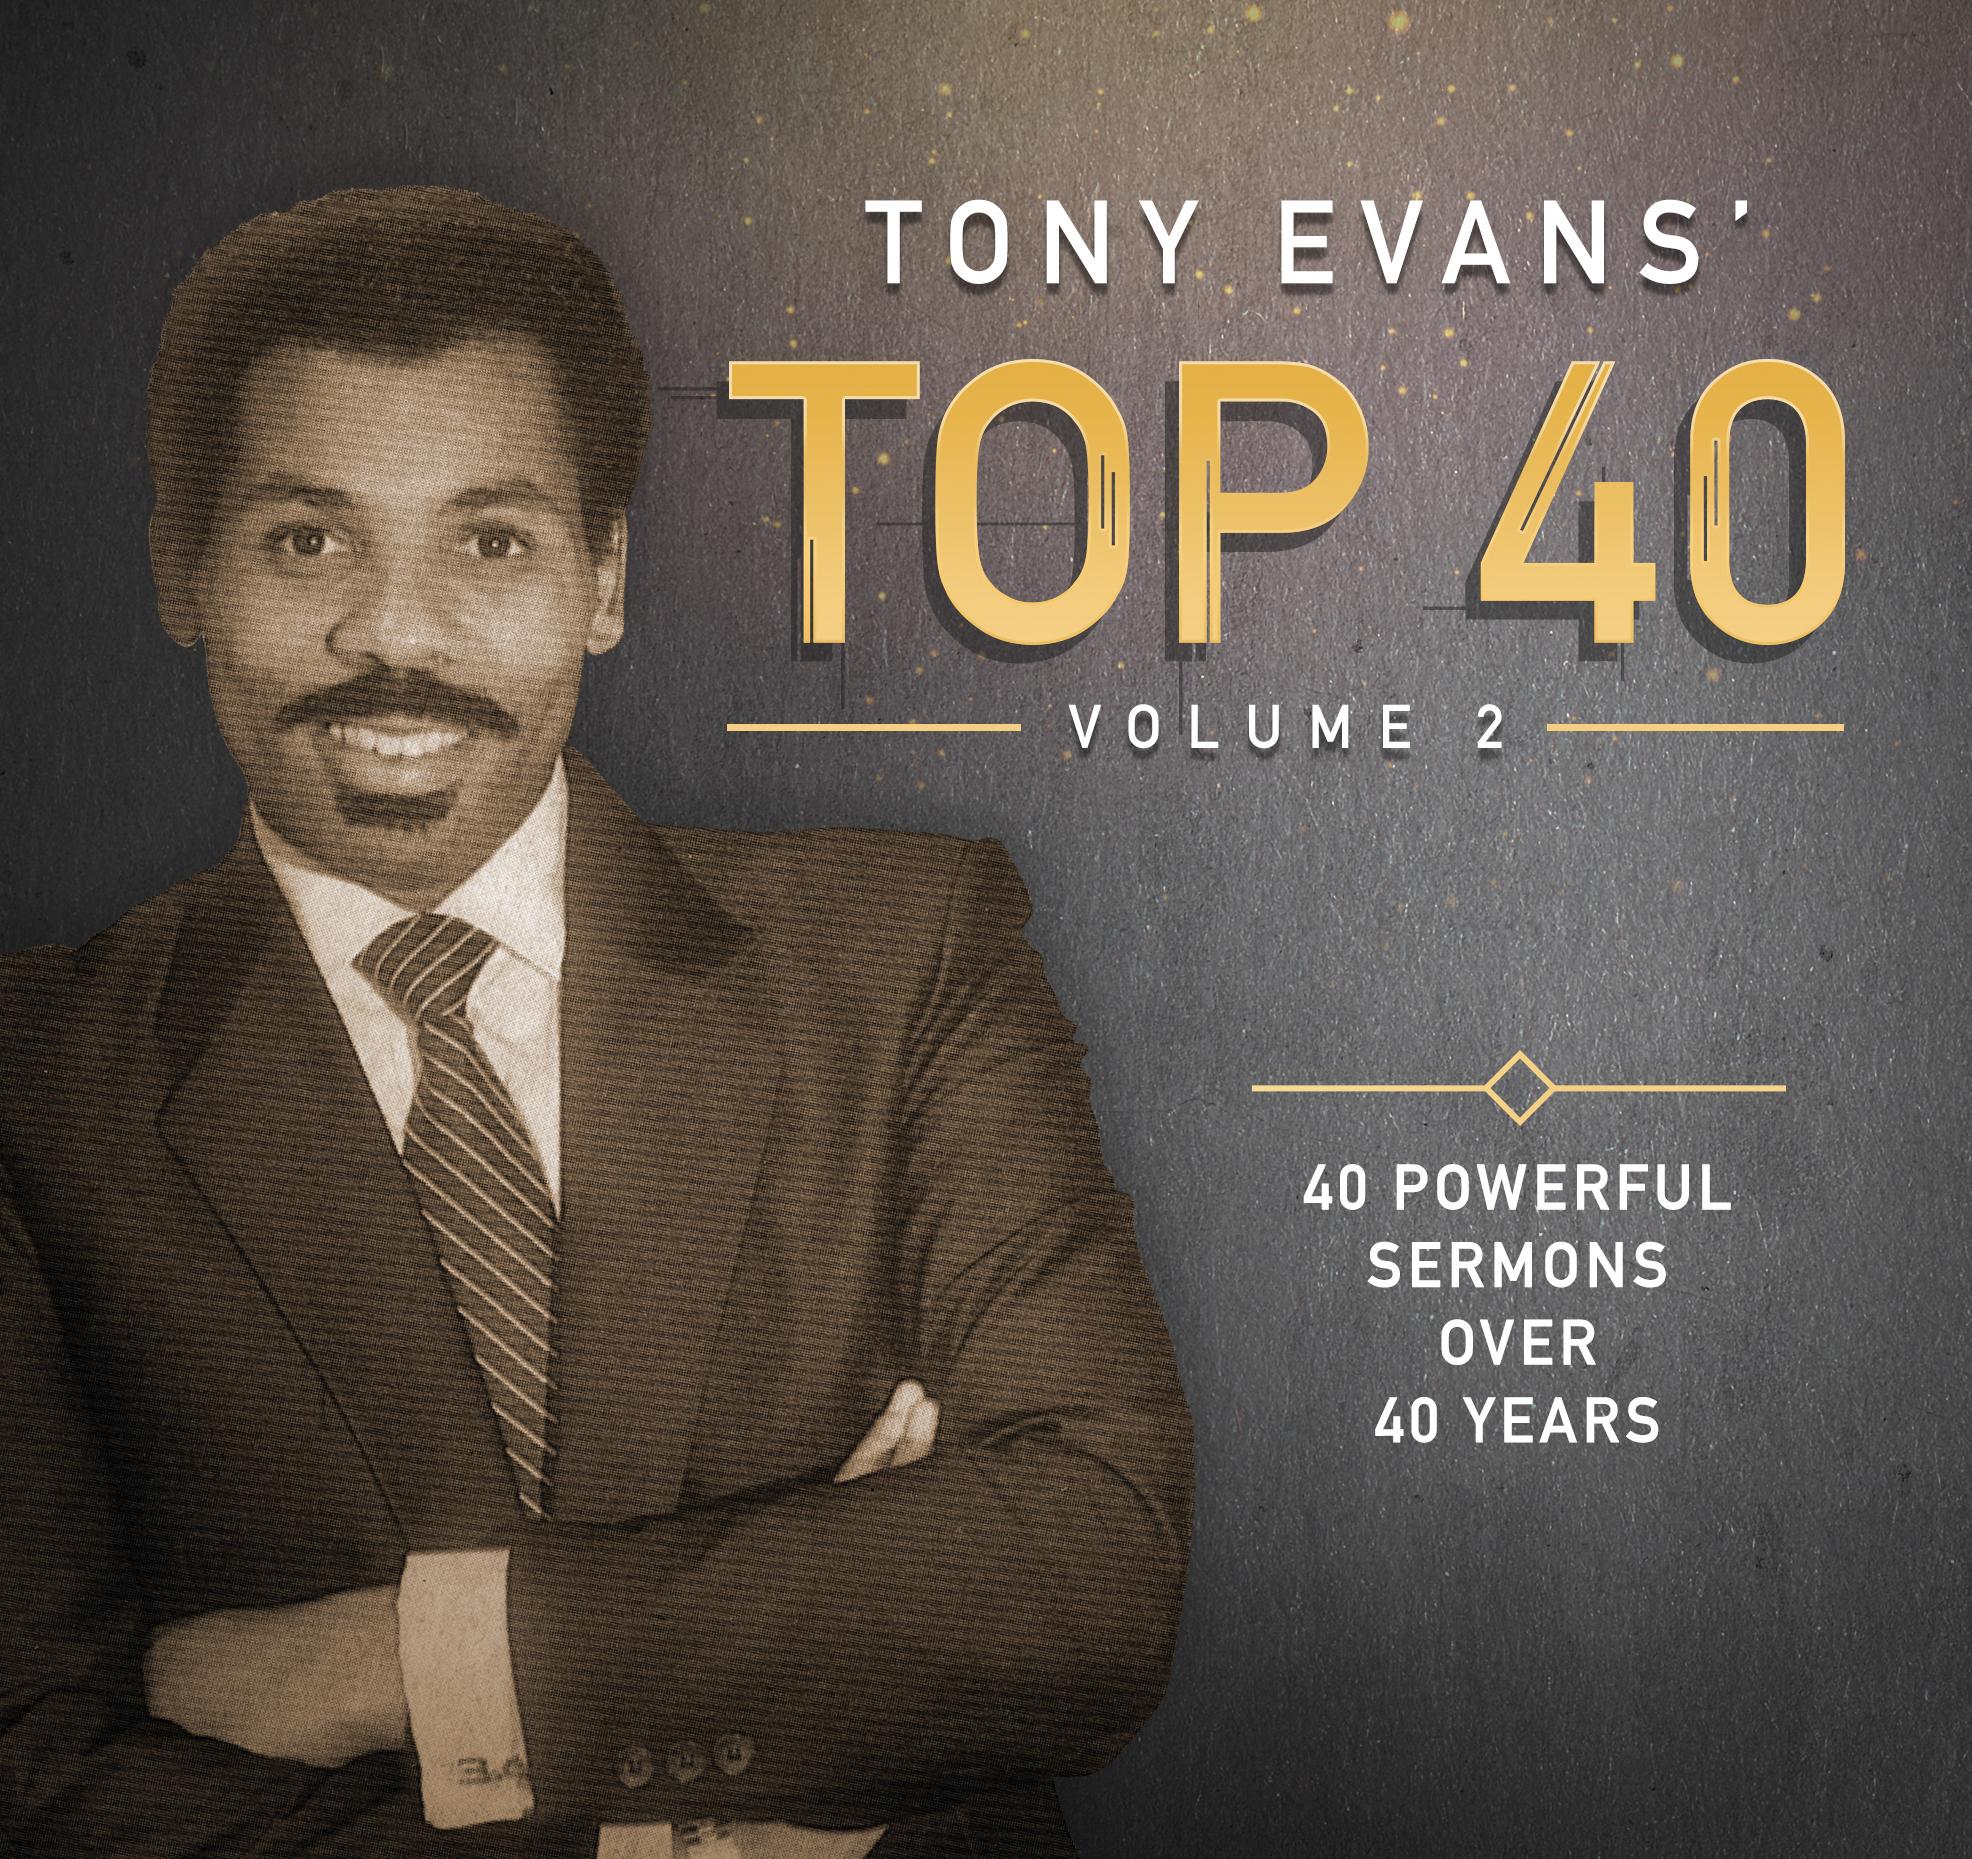 Tony Evans Top 40 V2